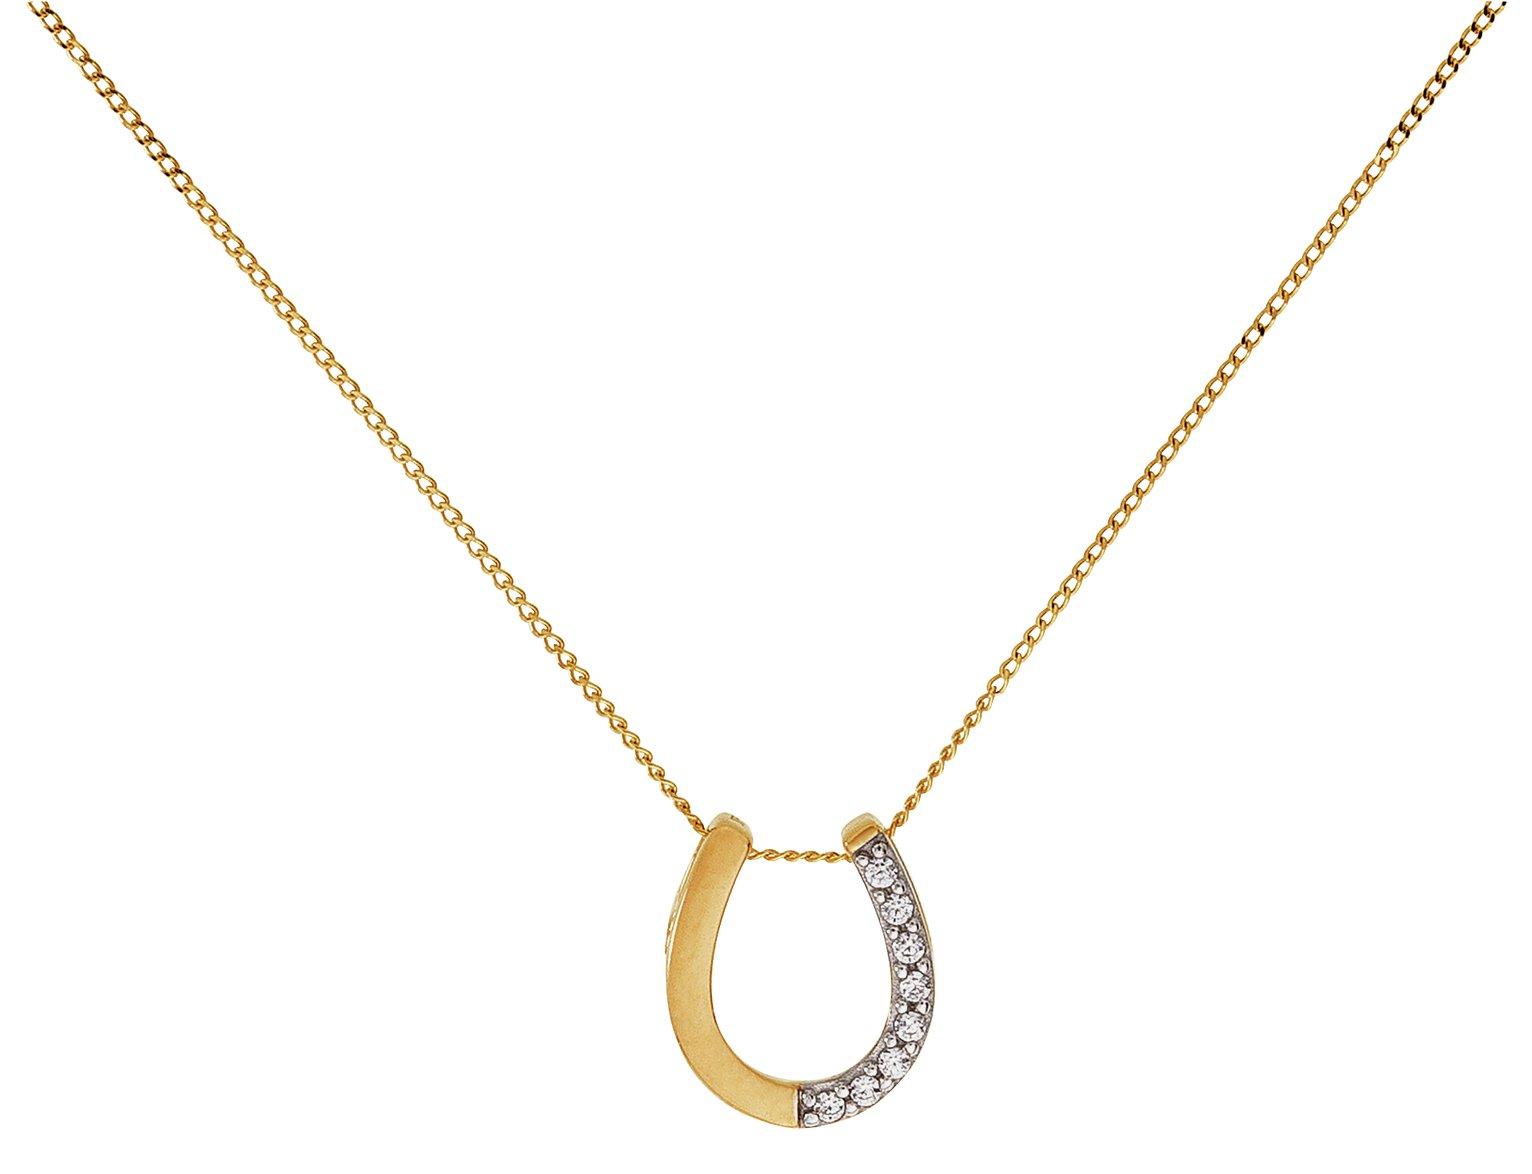 Image of Revere 9ct Gold Cubic Zirconia Horseshoe Pendant